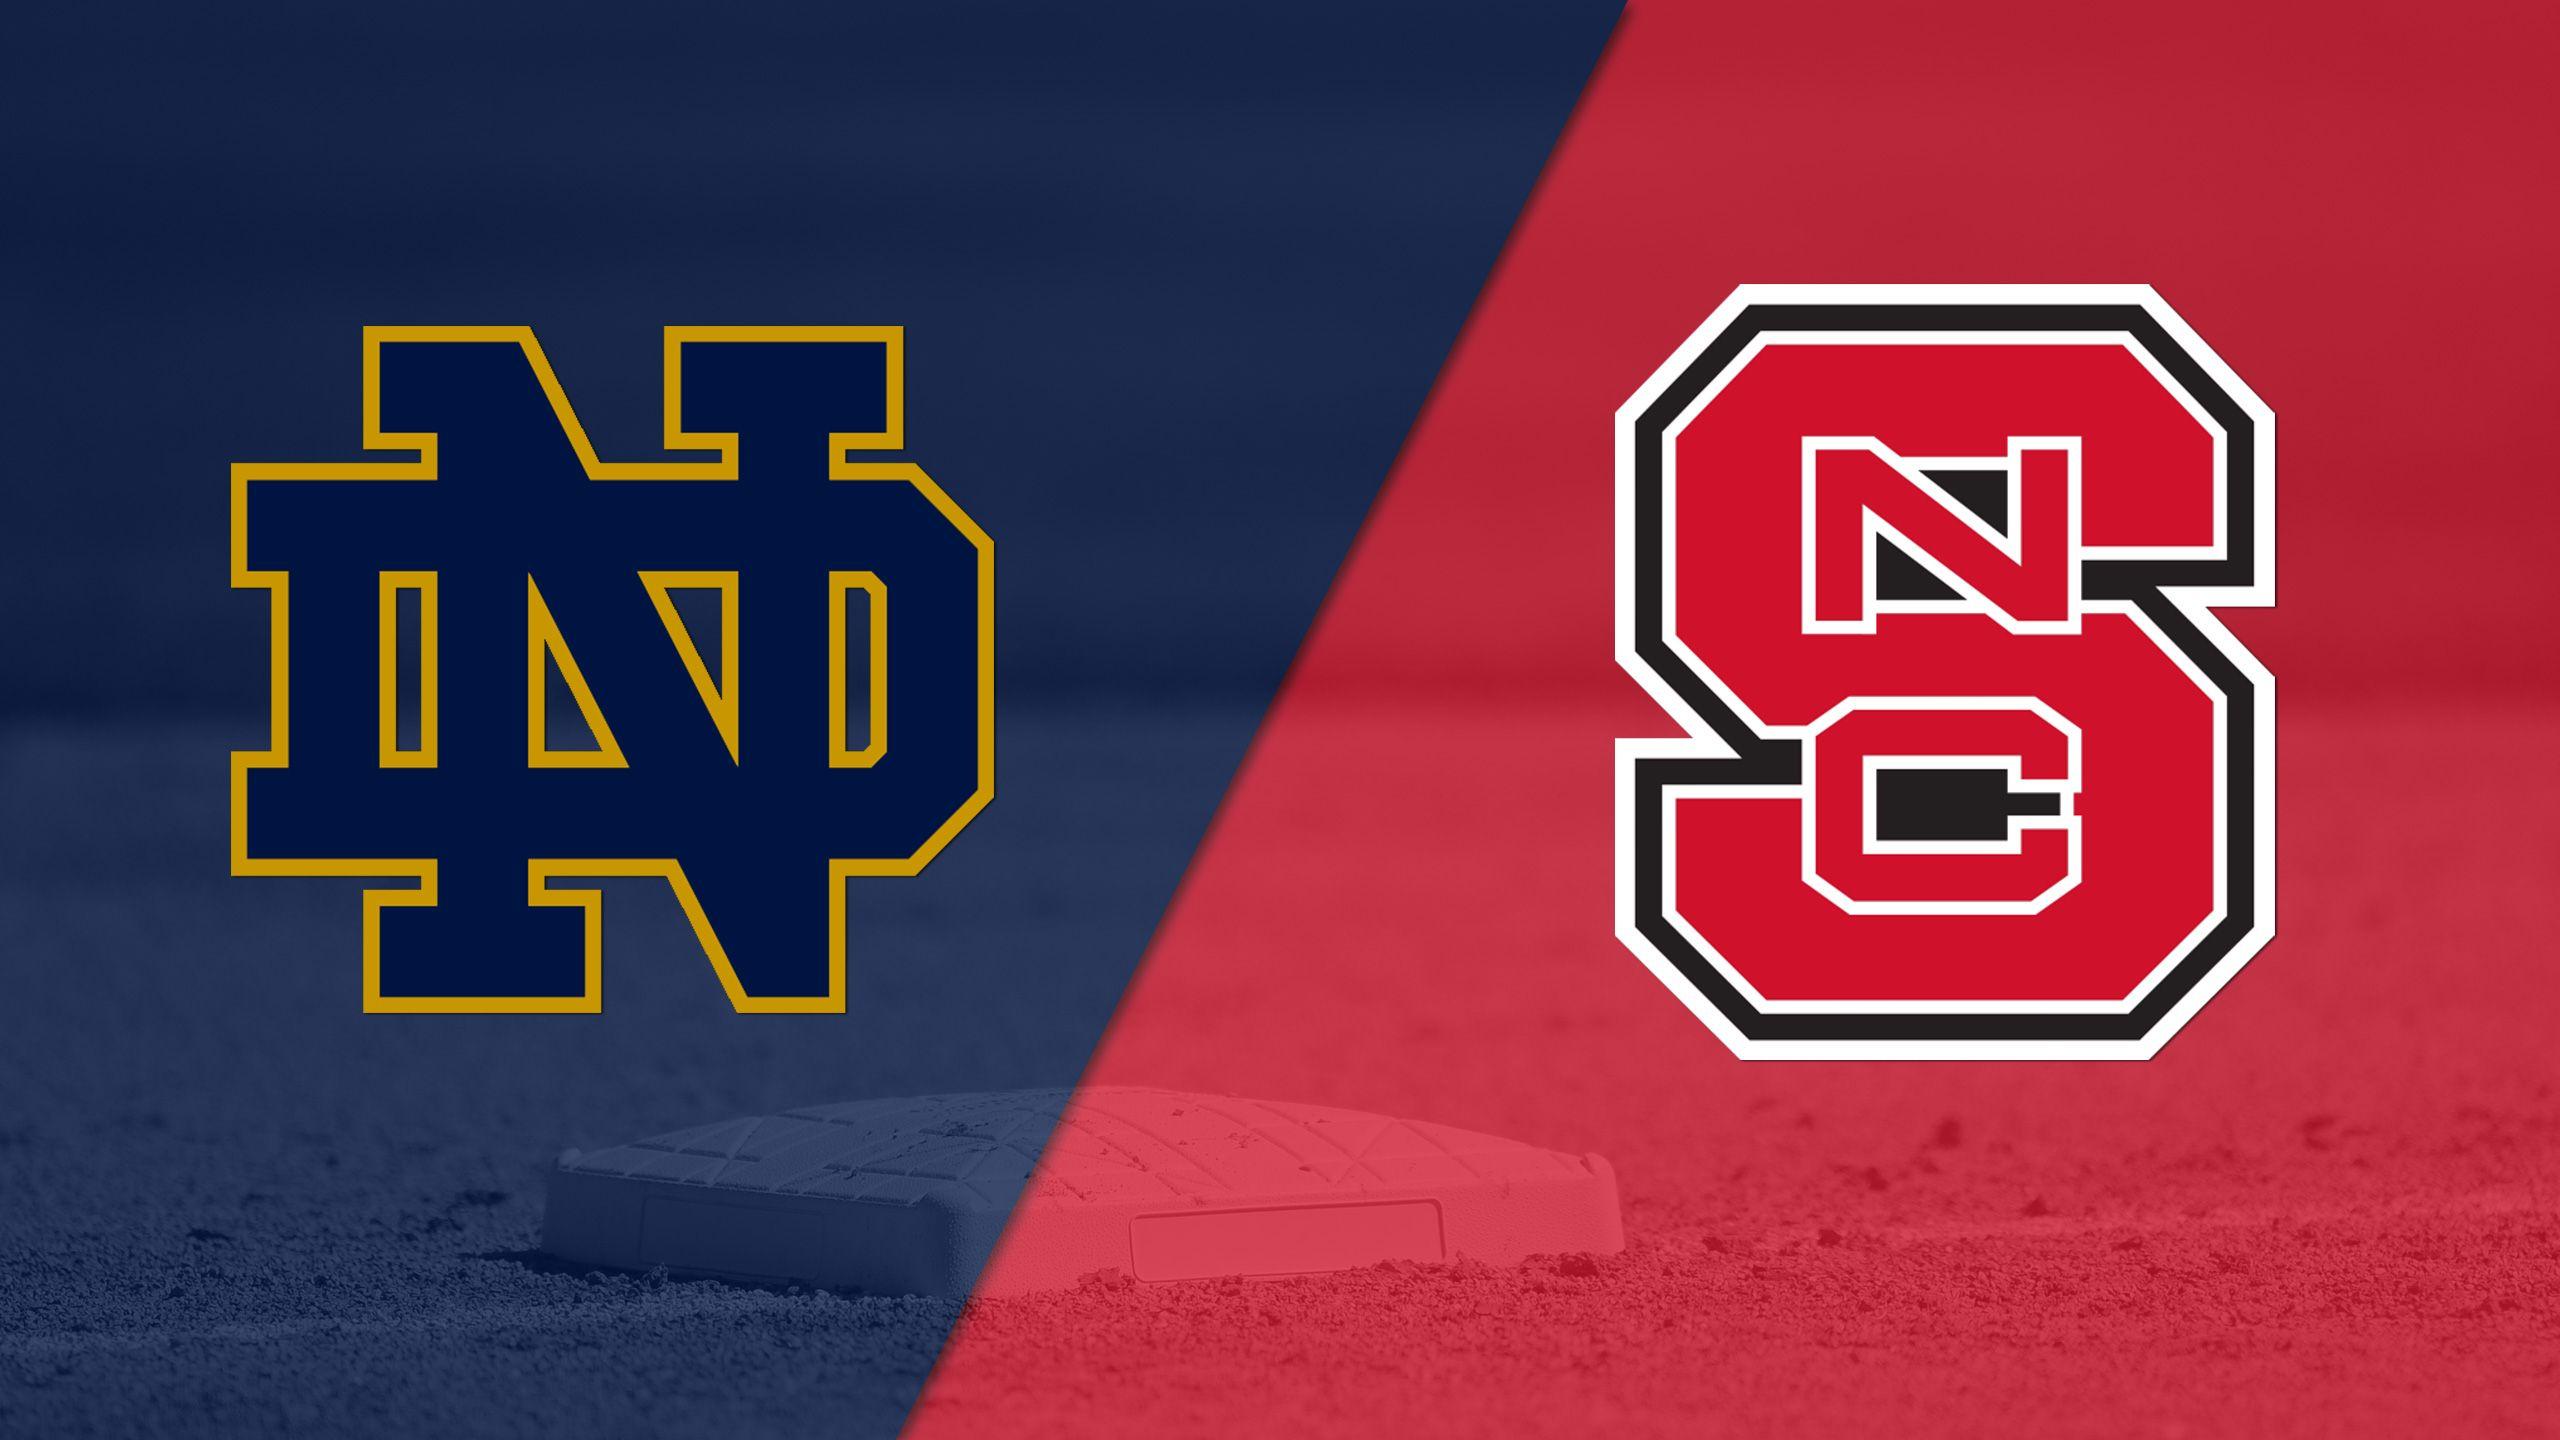 Notre Dame vs. NC State (Softball)